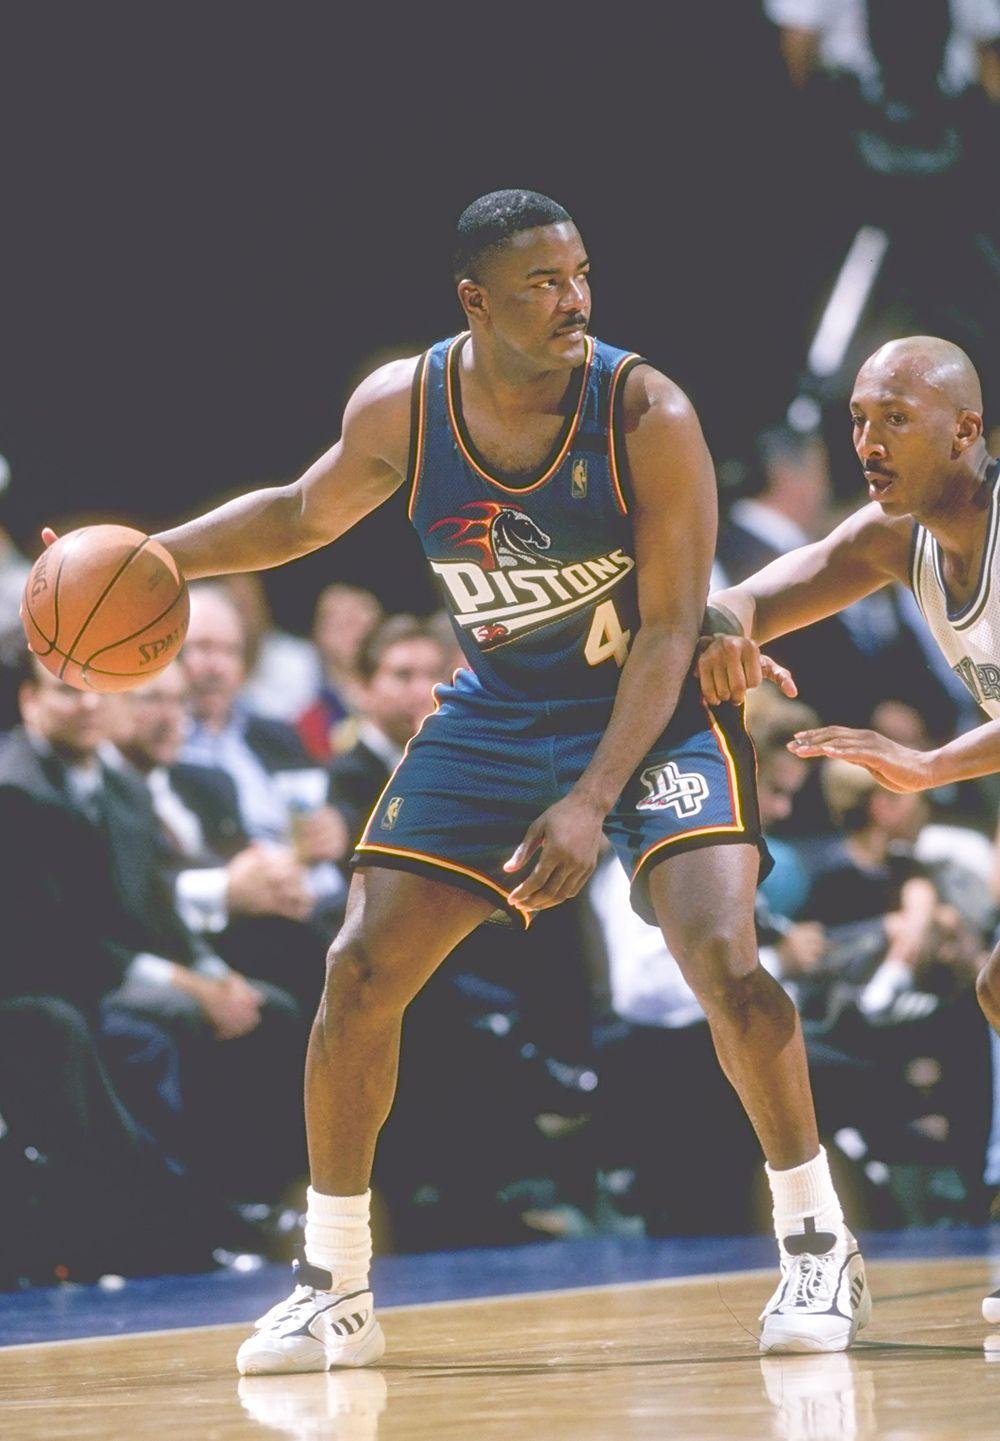 Joe Dumars All time great Detroit Pistons